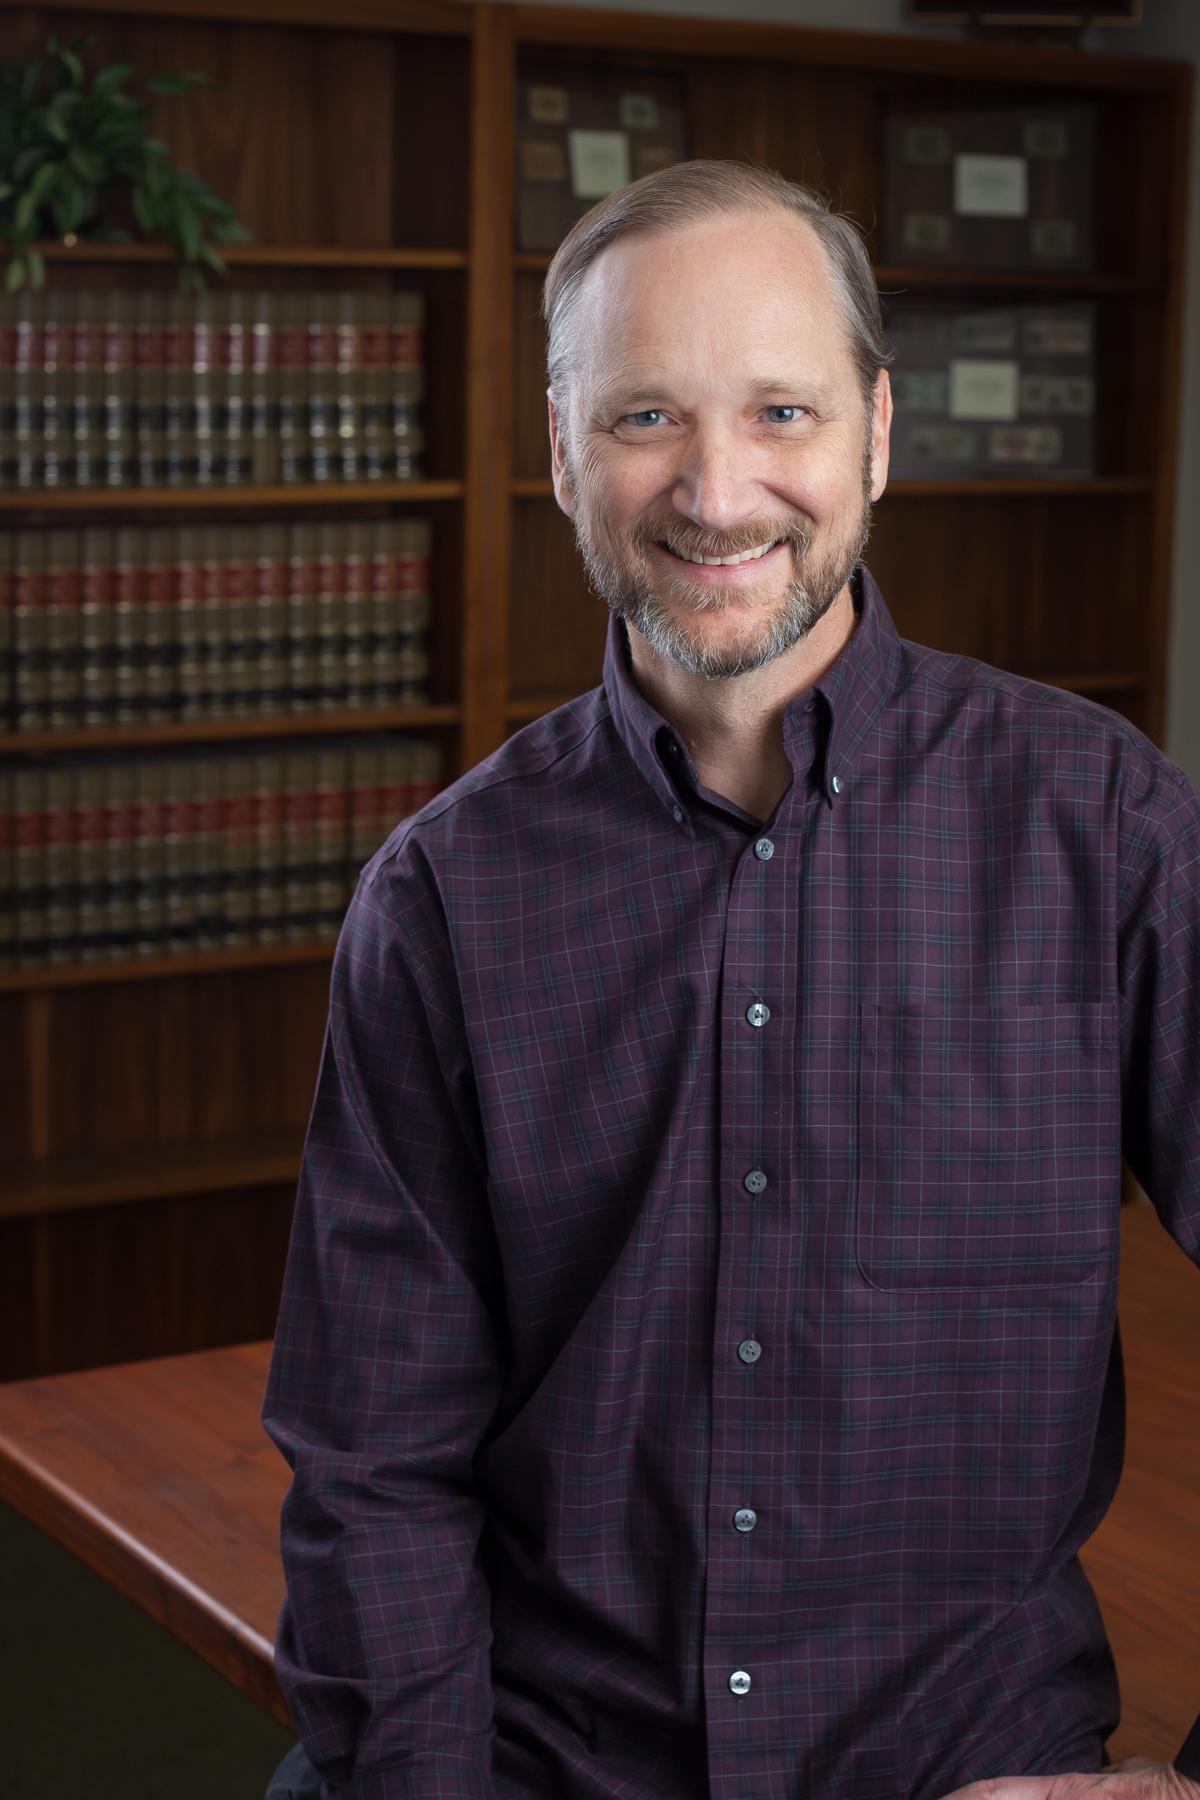 Havens Ii, Cloyd Attorney - Newell & Havens